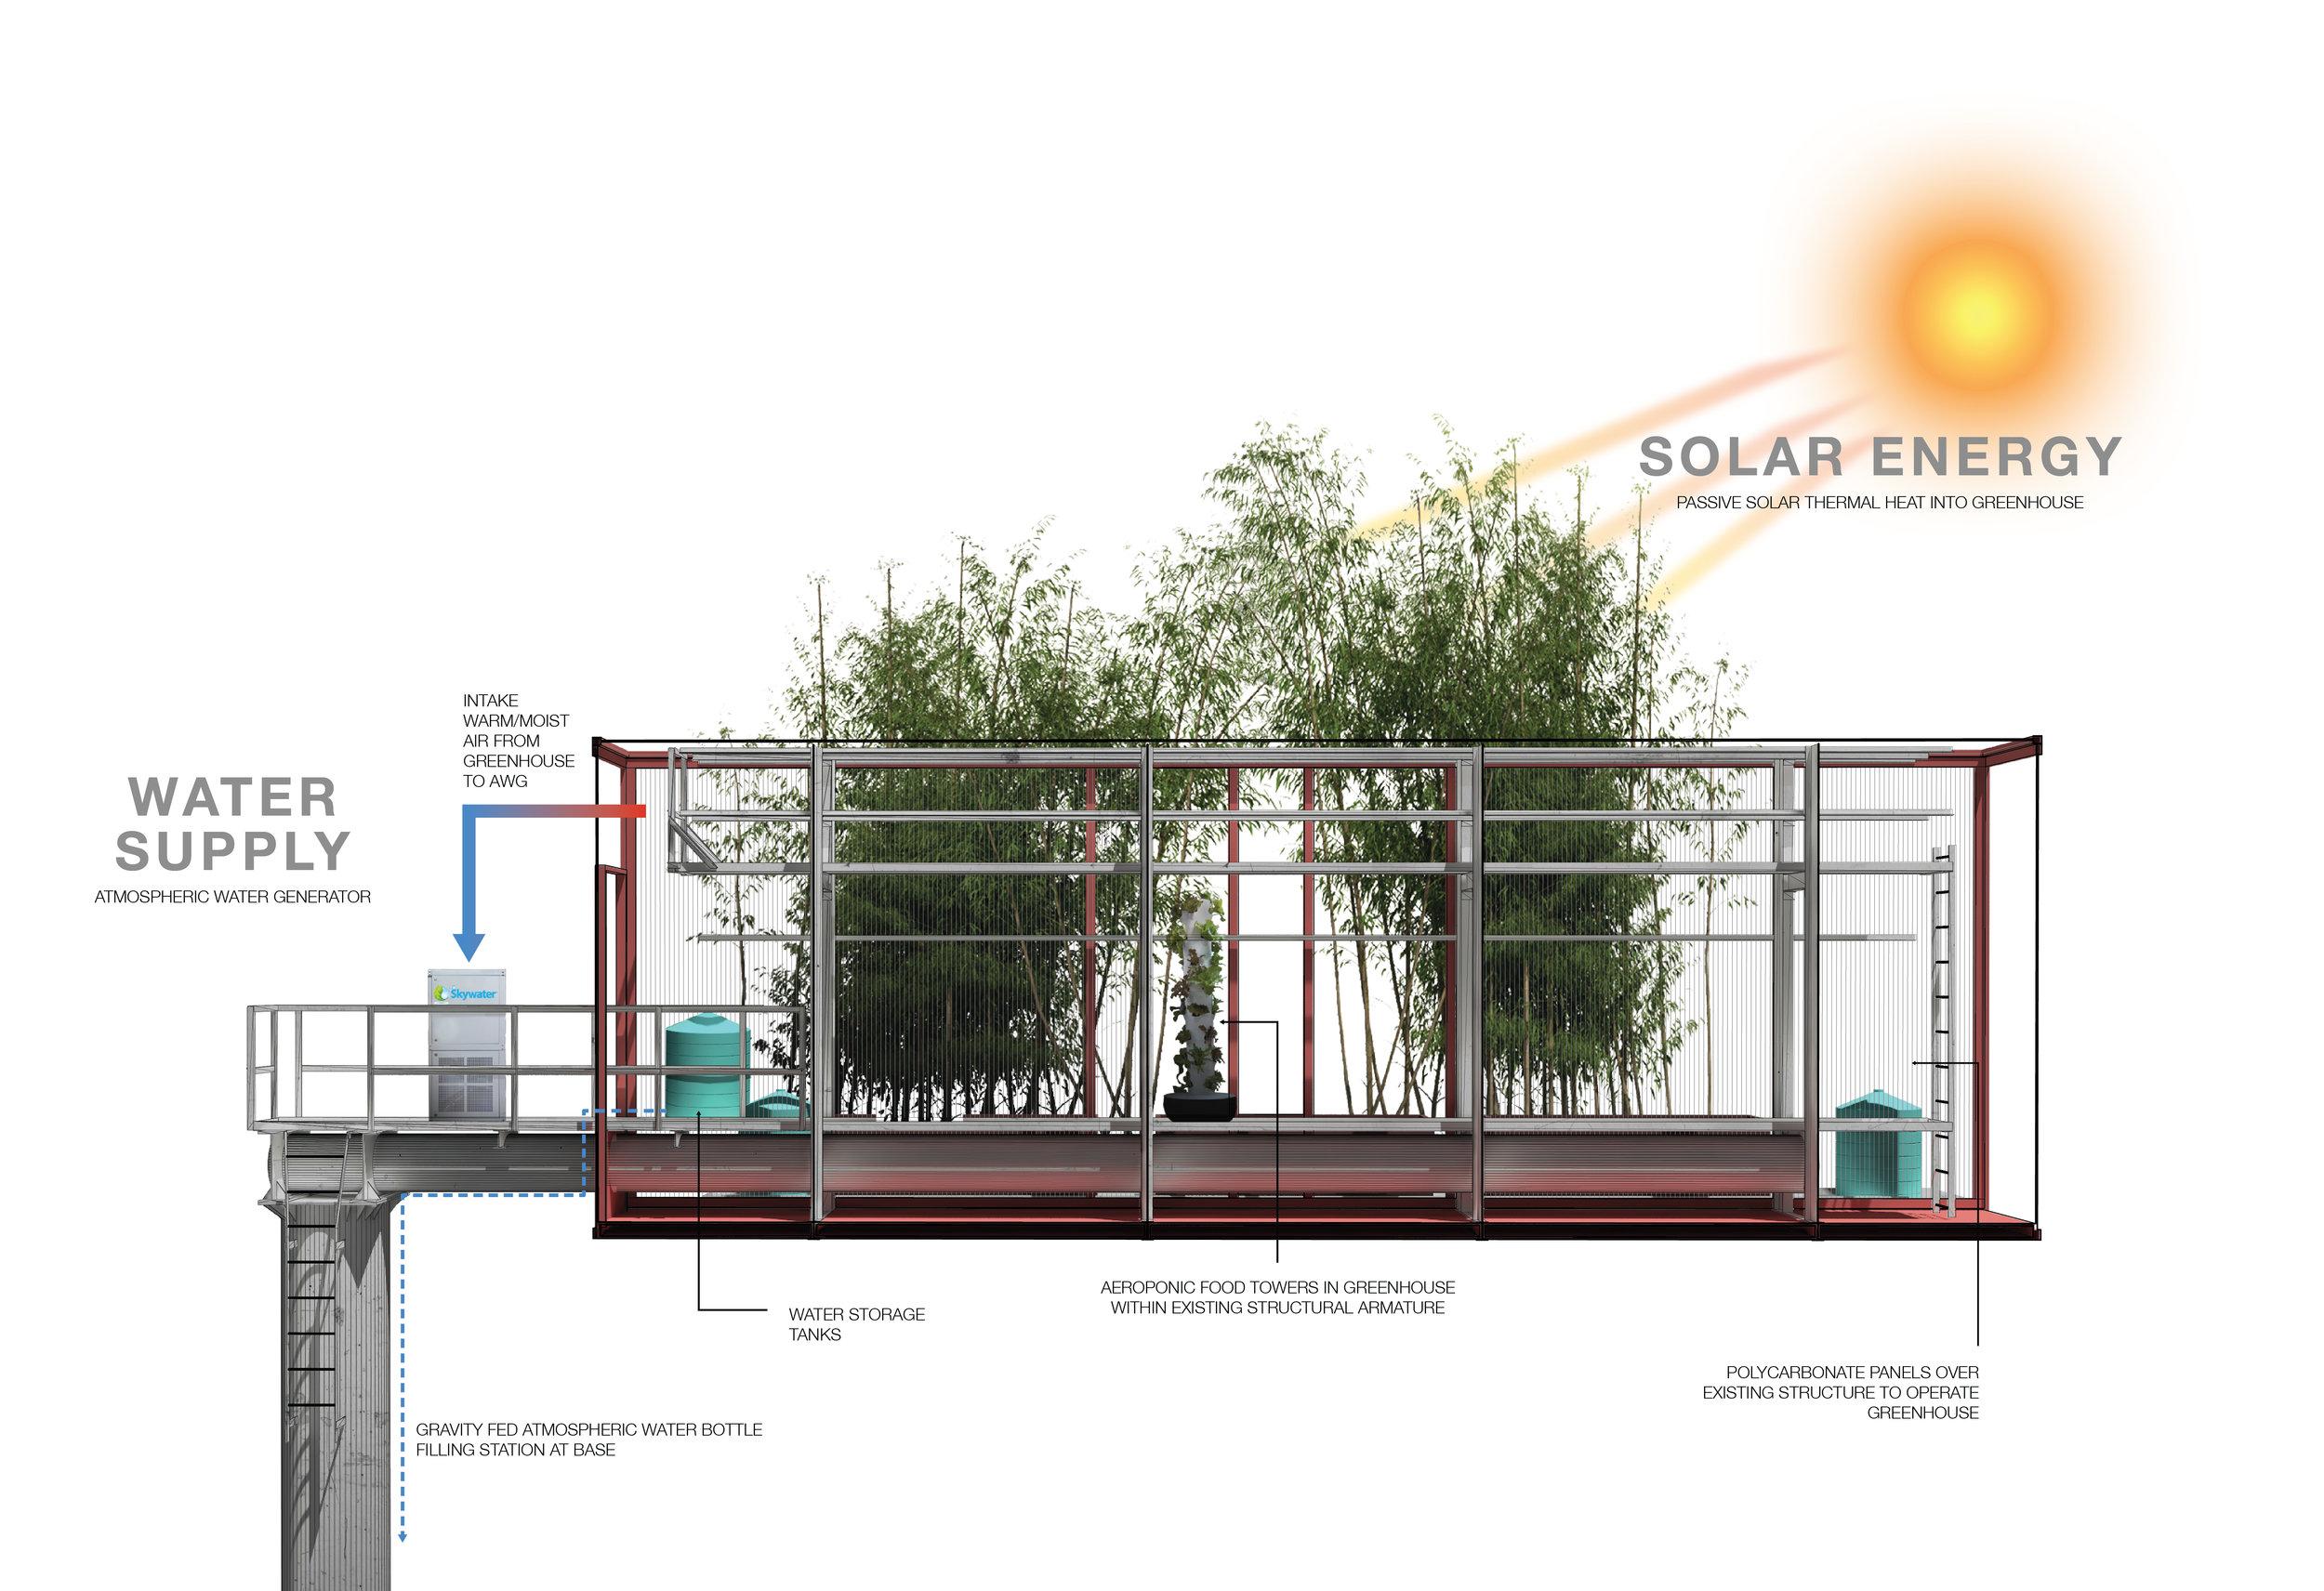 S.E.A.-Studio-Environmental-Architecture-David-Hertz-FAIA-Stephen-Glassman-Open-Air-Los-Angeles-sustainable-regenerative-restorative-green-infrastructure-design-bottle-filling-station-upcycle-billboard-advertising-speculative-art-sculpture-bamboo-3.jpg